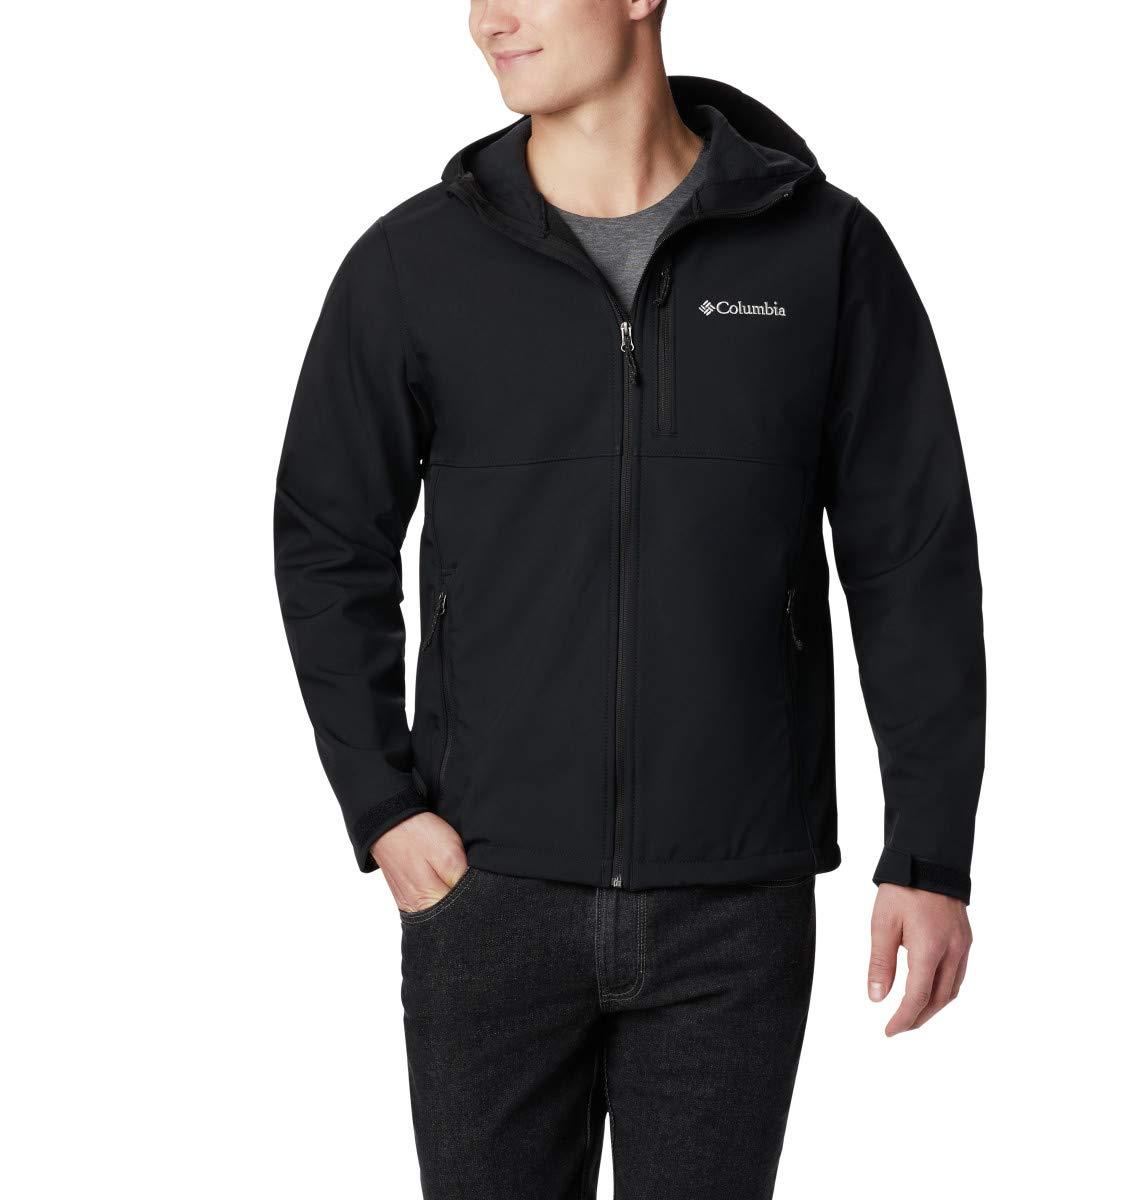 Columbia Men's Ascender Hooded Softshell Jacket, Black, Medium by Columbia